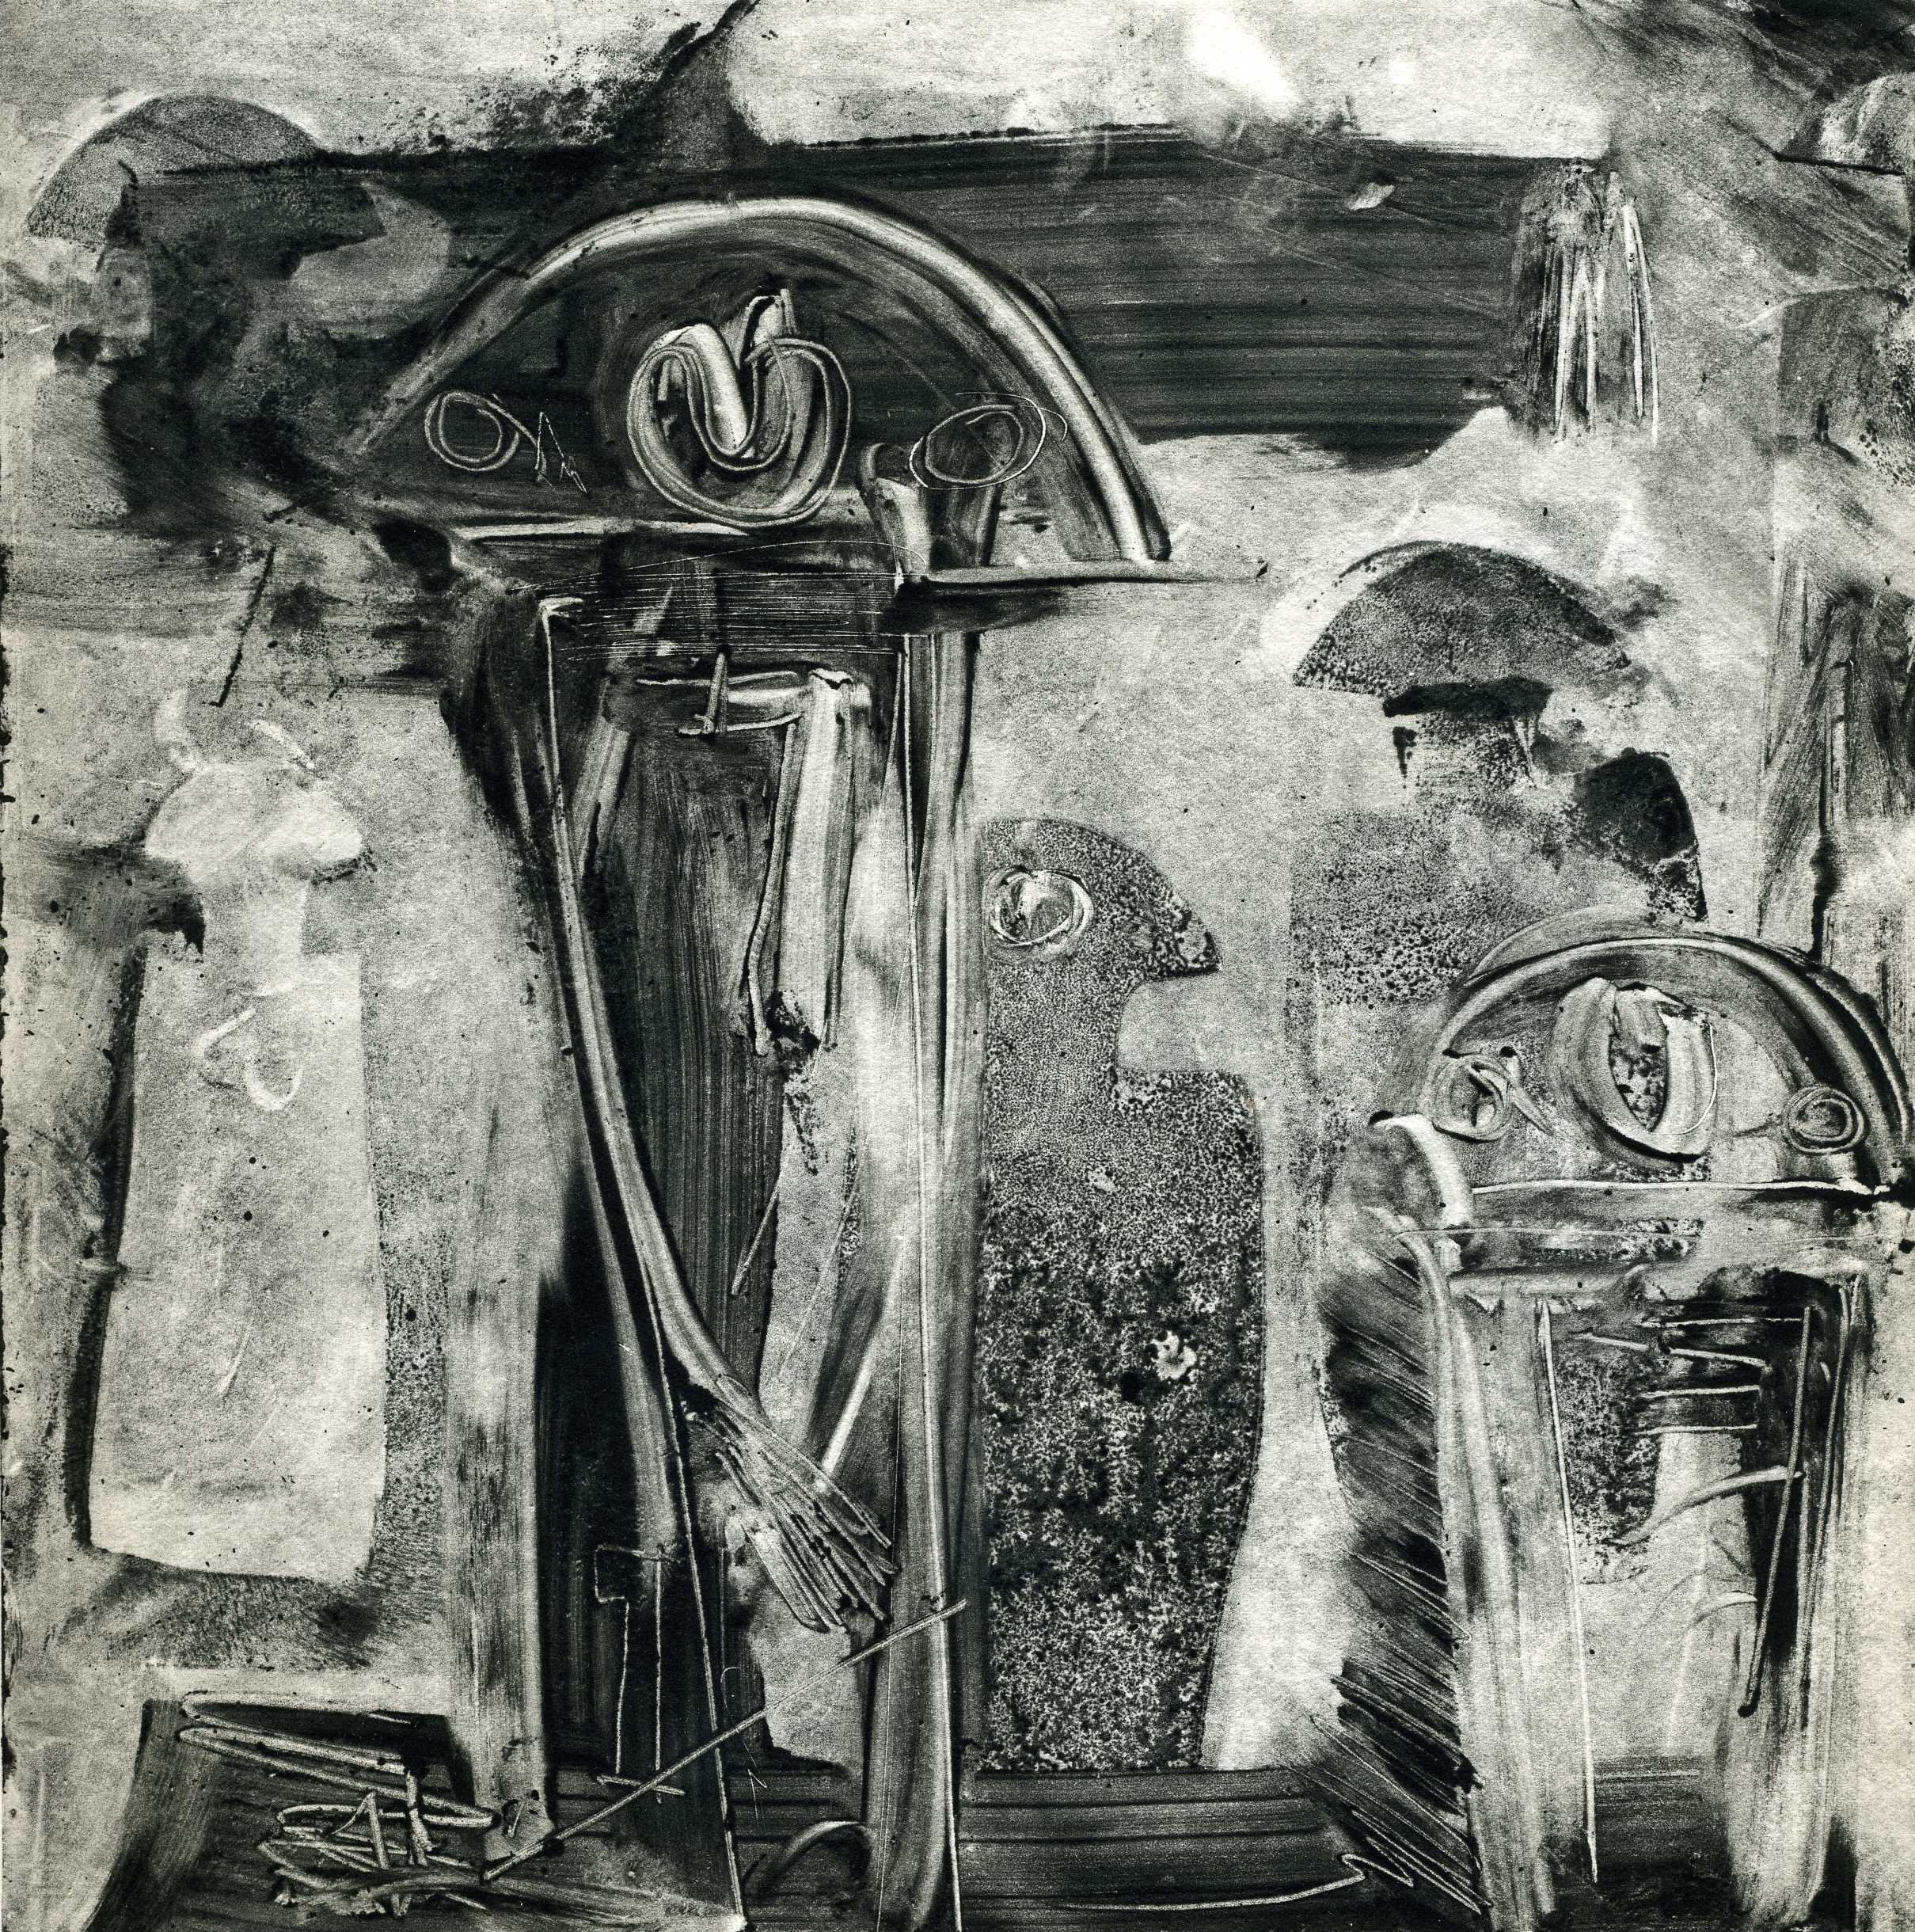 Statue-Stele of Lunigiana